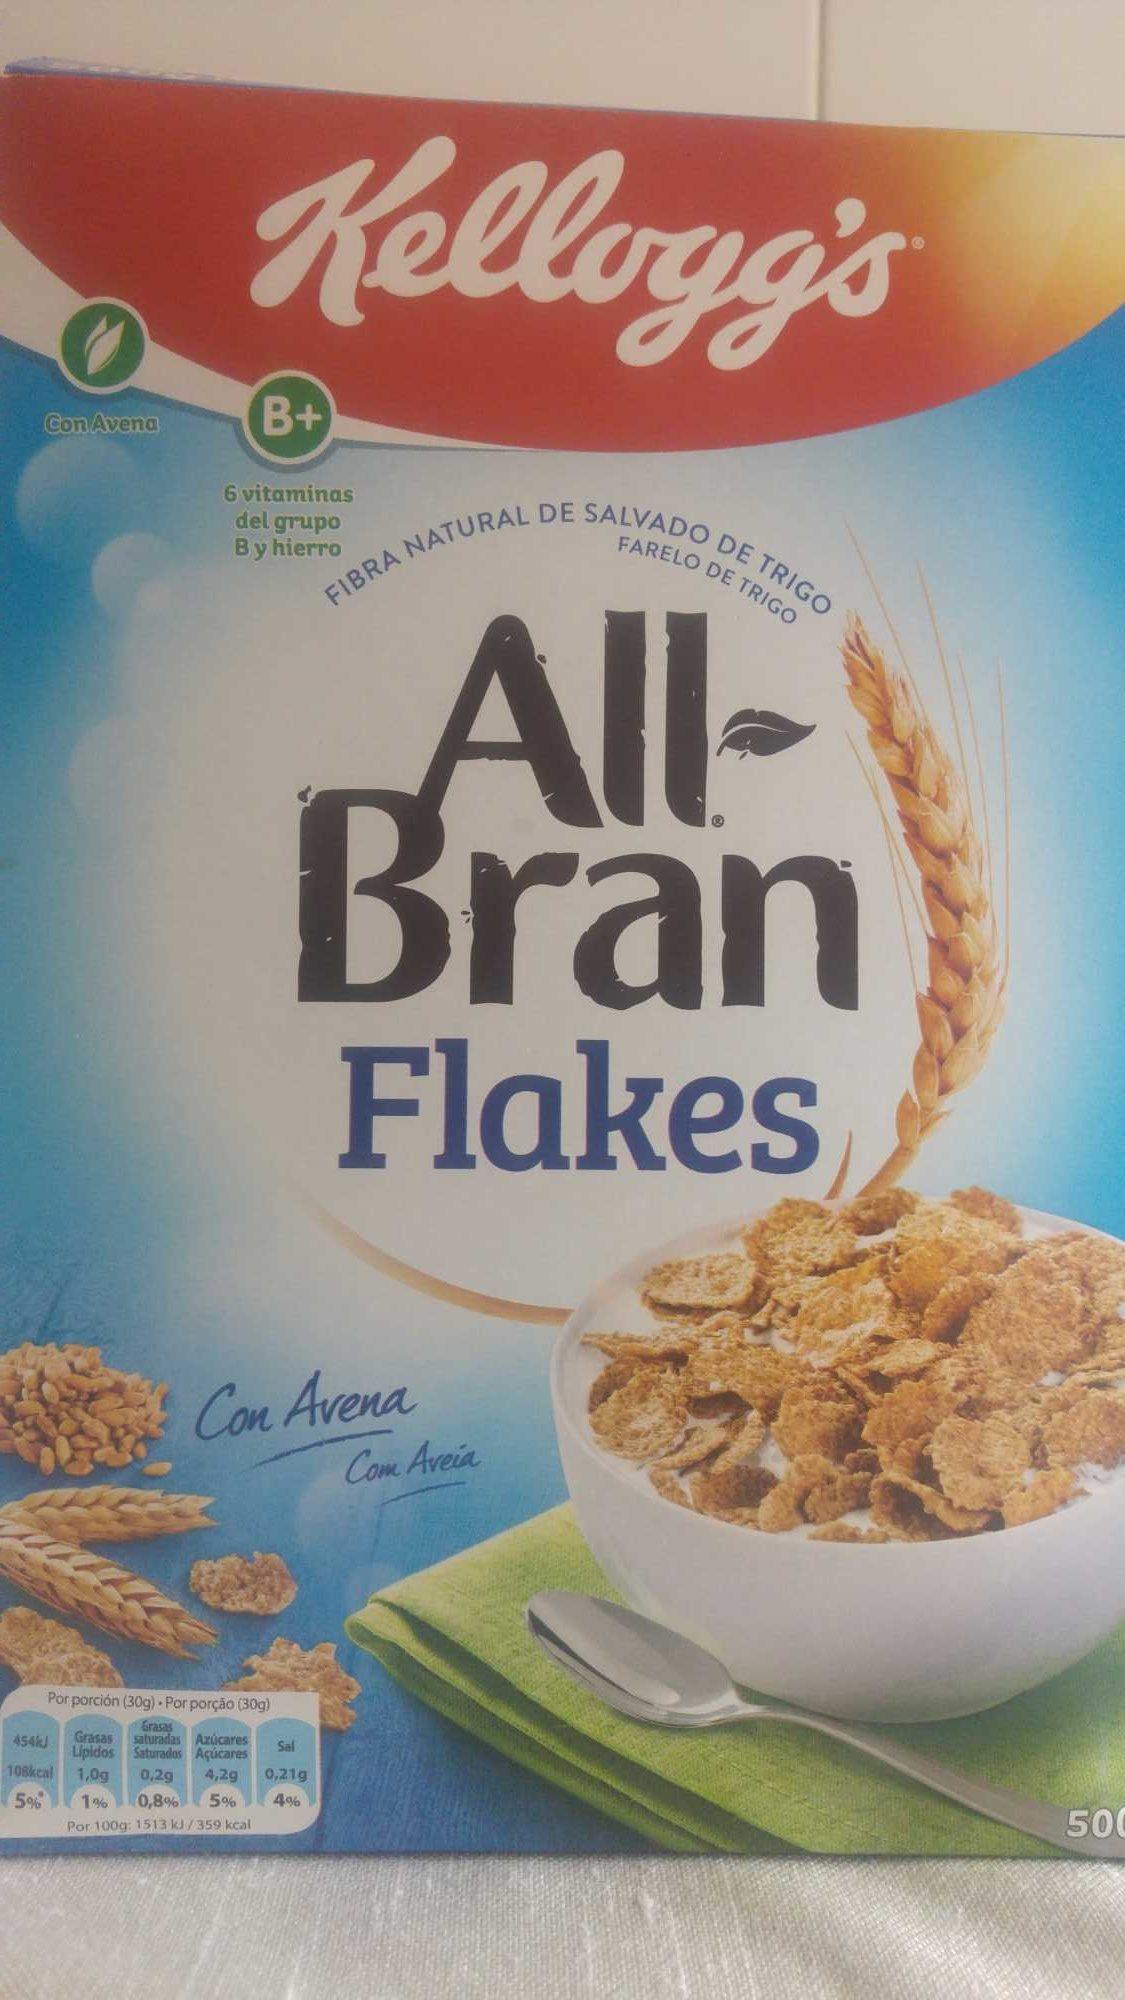 All Bran Flakes - Kellogg's - Product - en